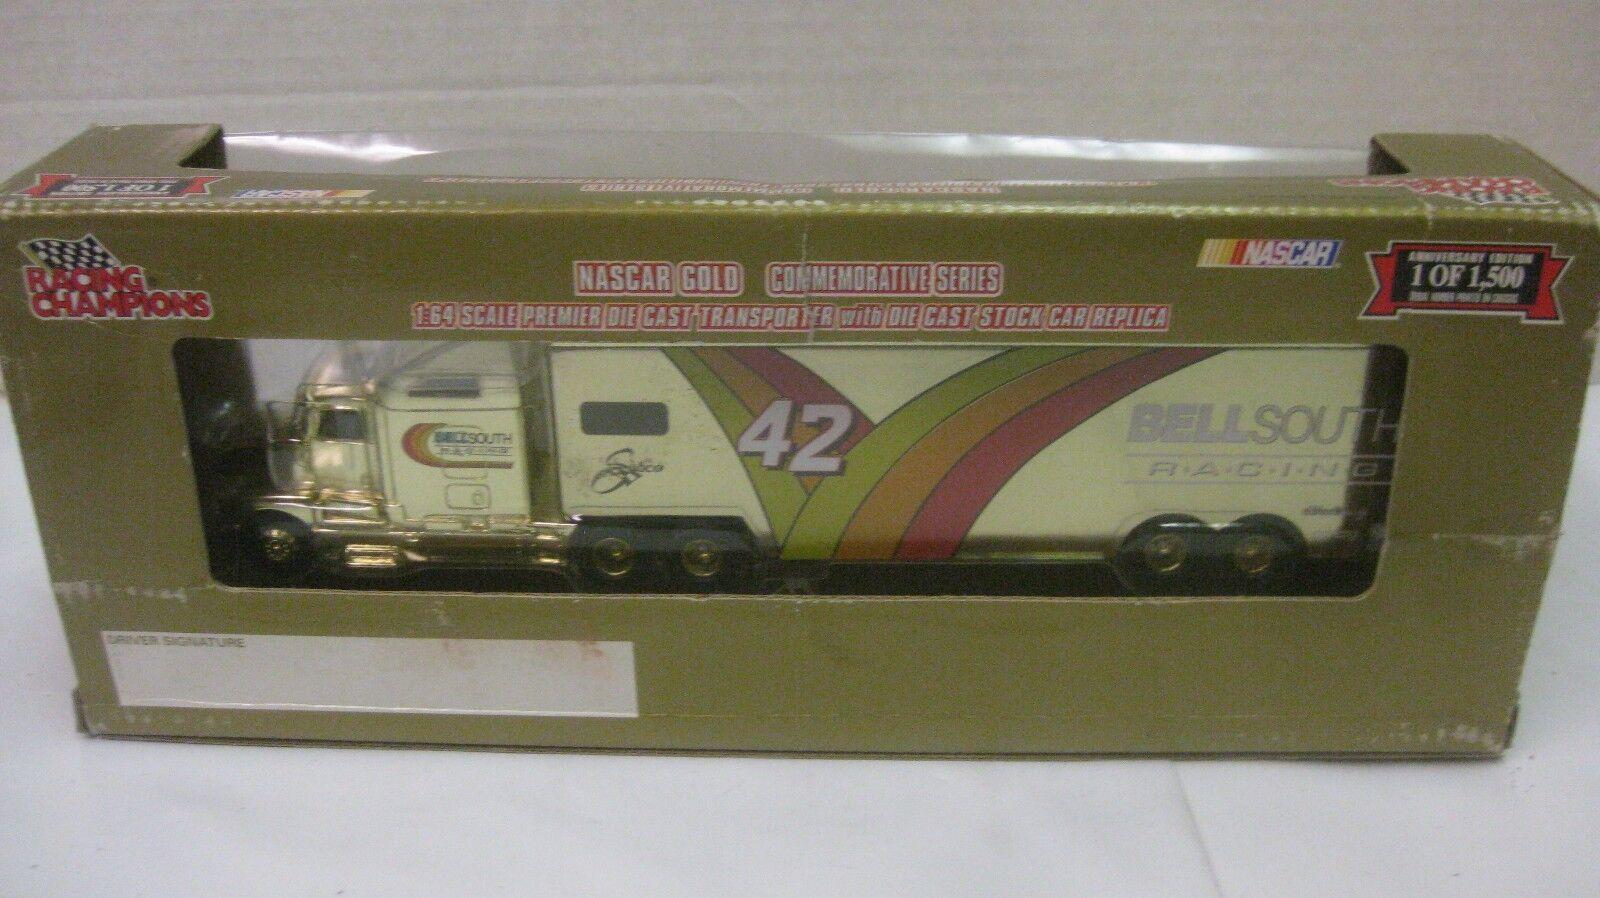 negozio online Nasauto Nasauto Nasauto Joe Nemechek Firmato  42 Bell Sud oro Hauler 1 64 Scala Diecast Rc 1998  liquidazione